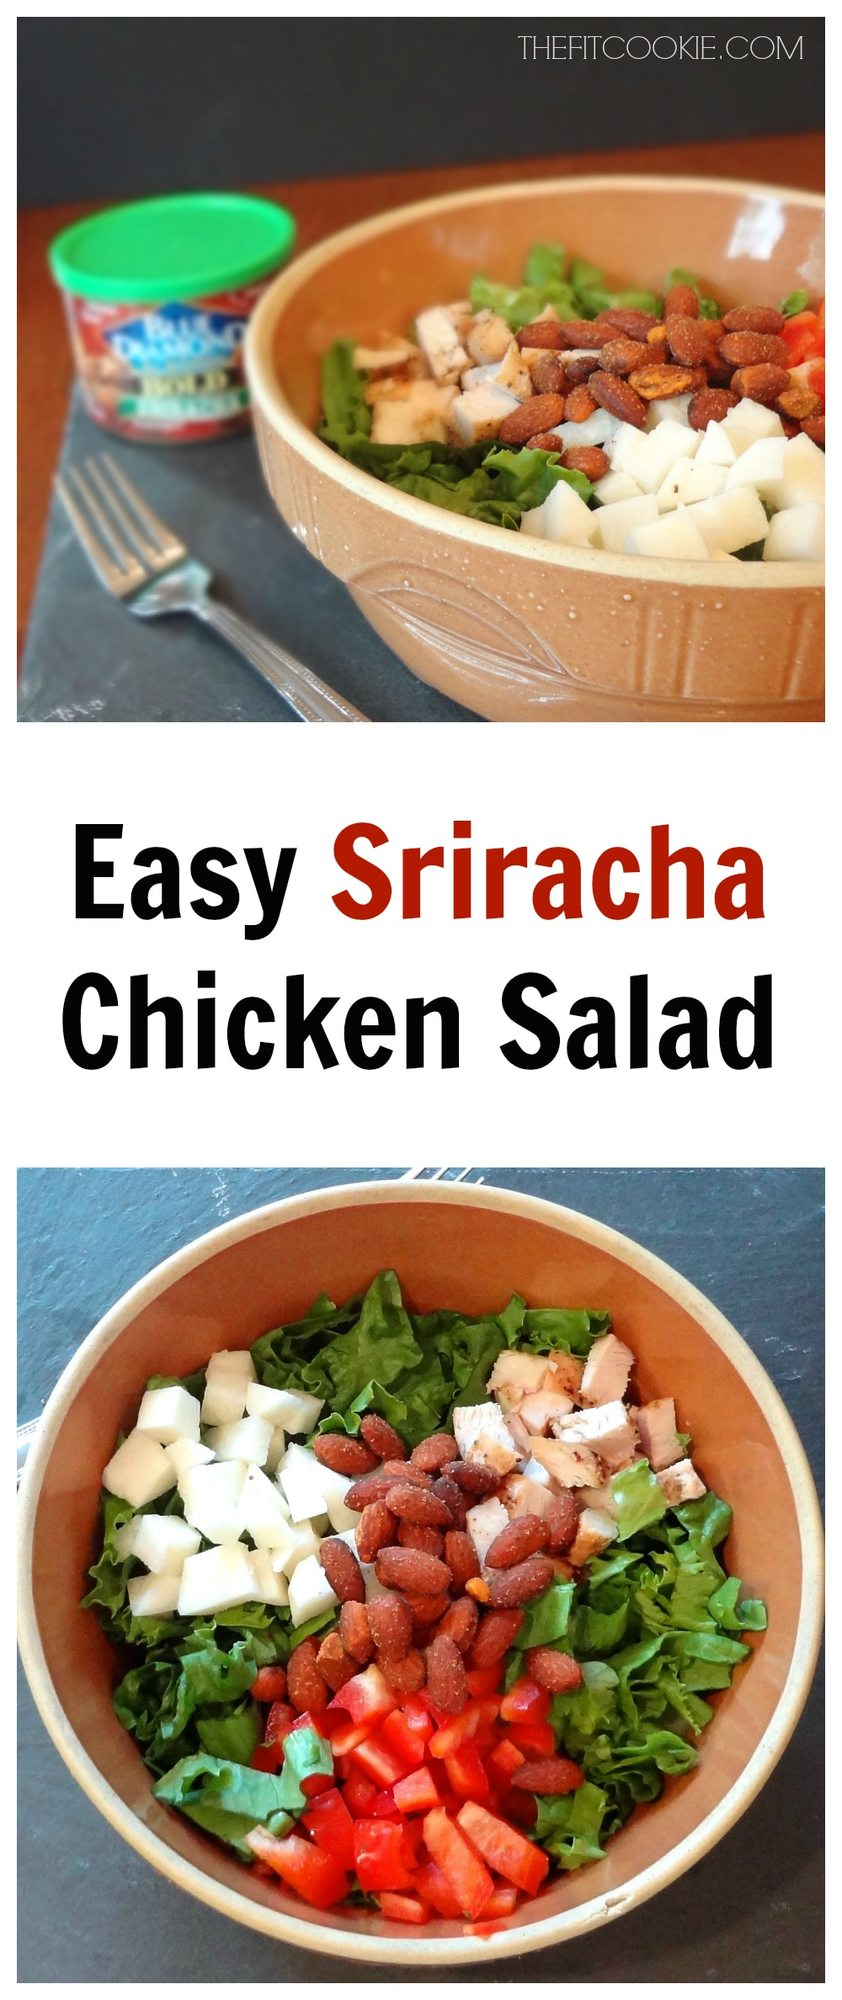 The perfect summer salad: Easy Sriracha Chicken Salad - #sponsored #recipe #salad @BlueDiamond @TheFitCookie